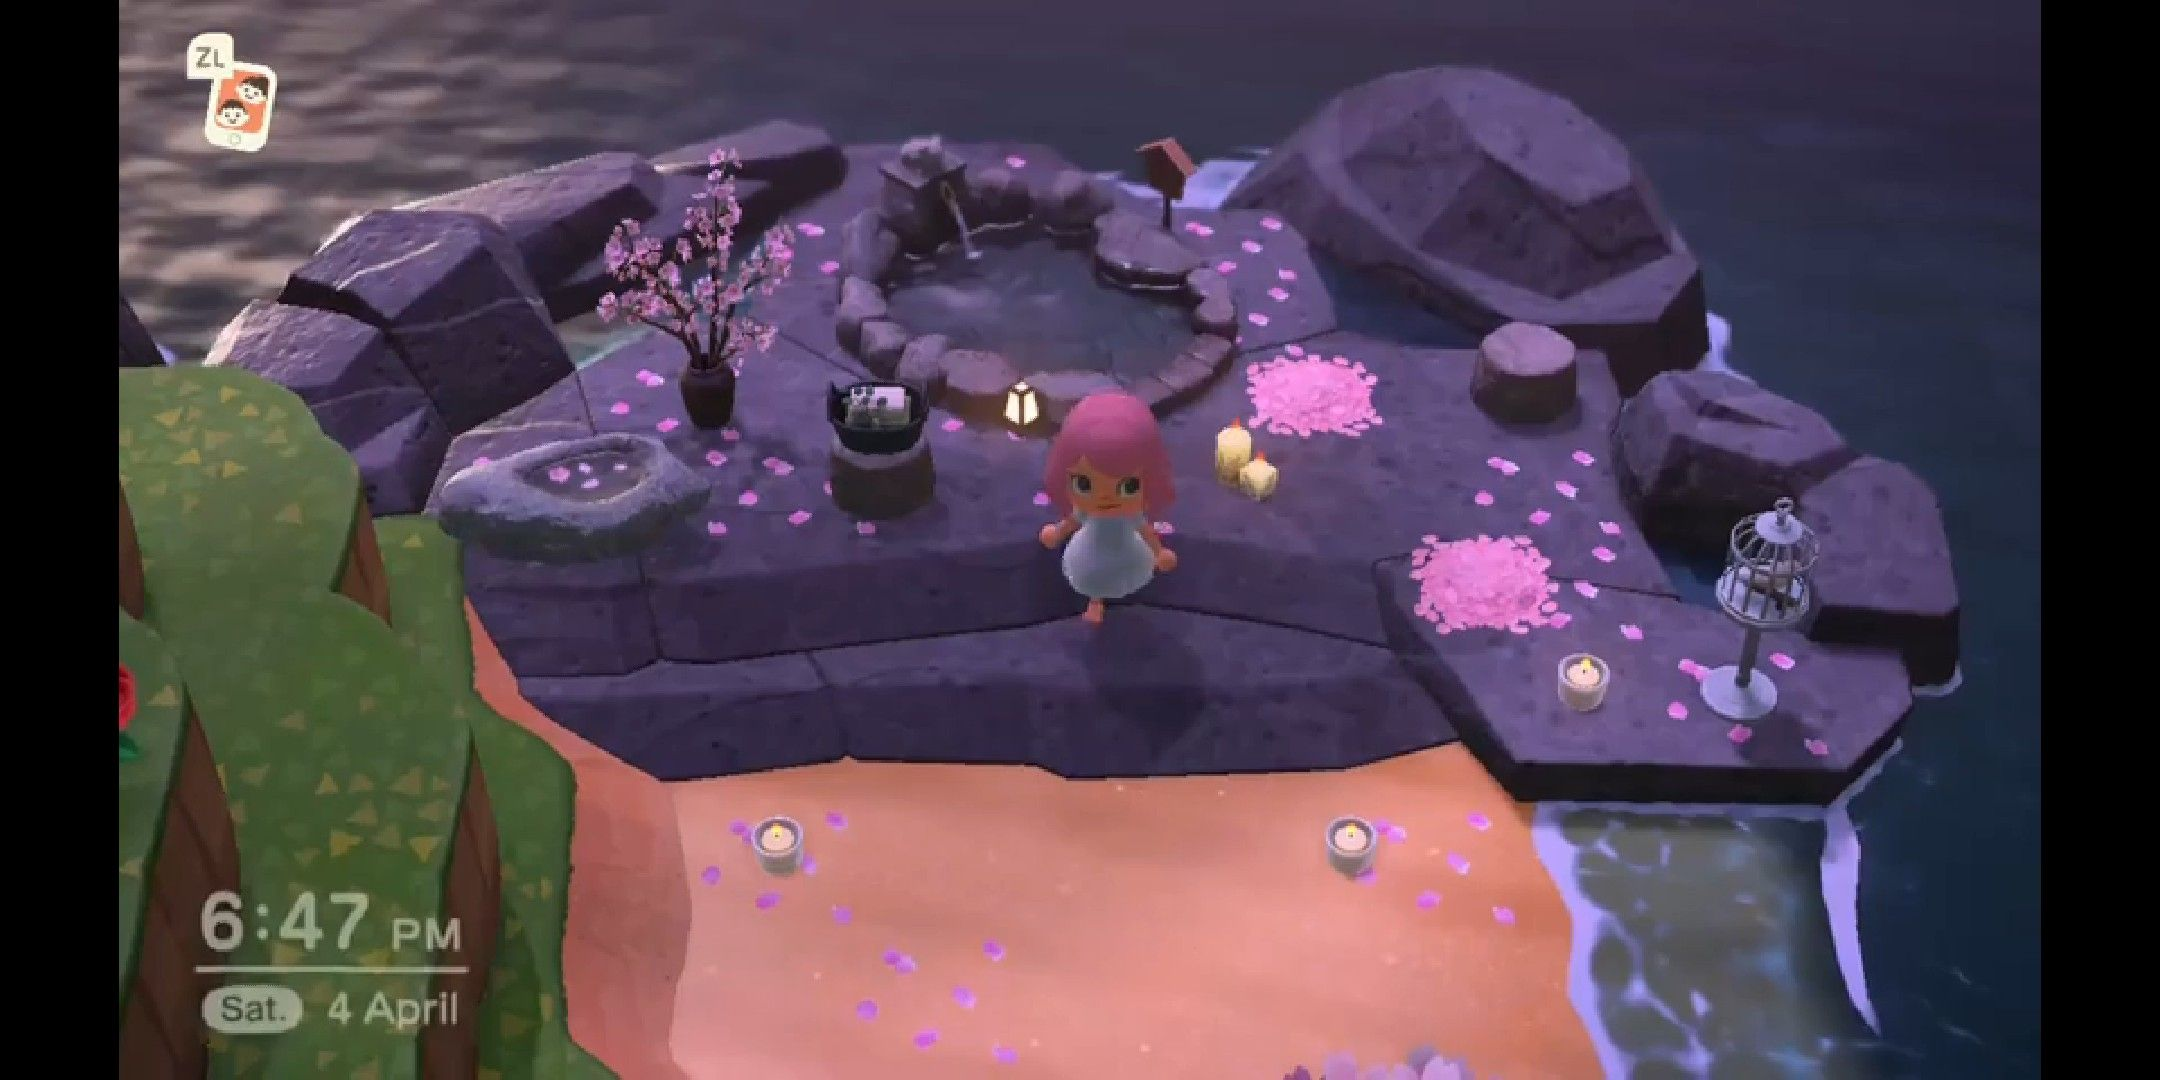 Acnh Sakura Onsen In 2020 Animal Crossing 3ds Animal Crossing New Animal Crossing